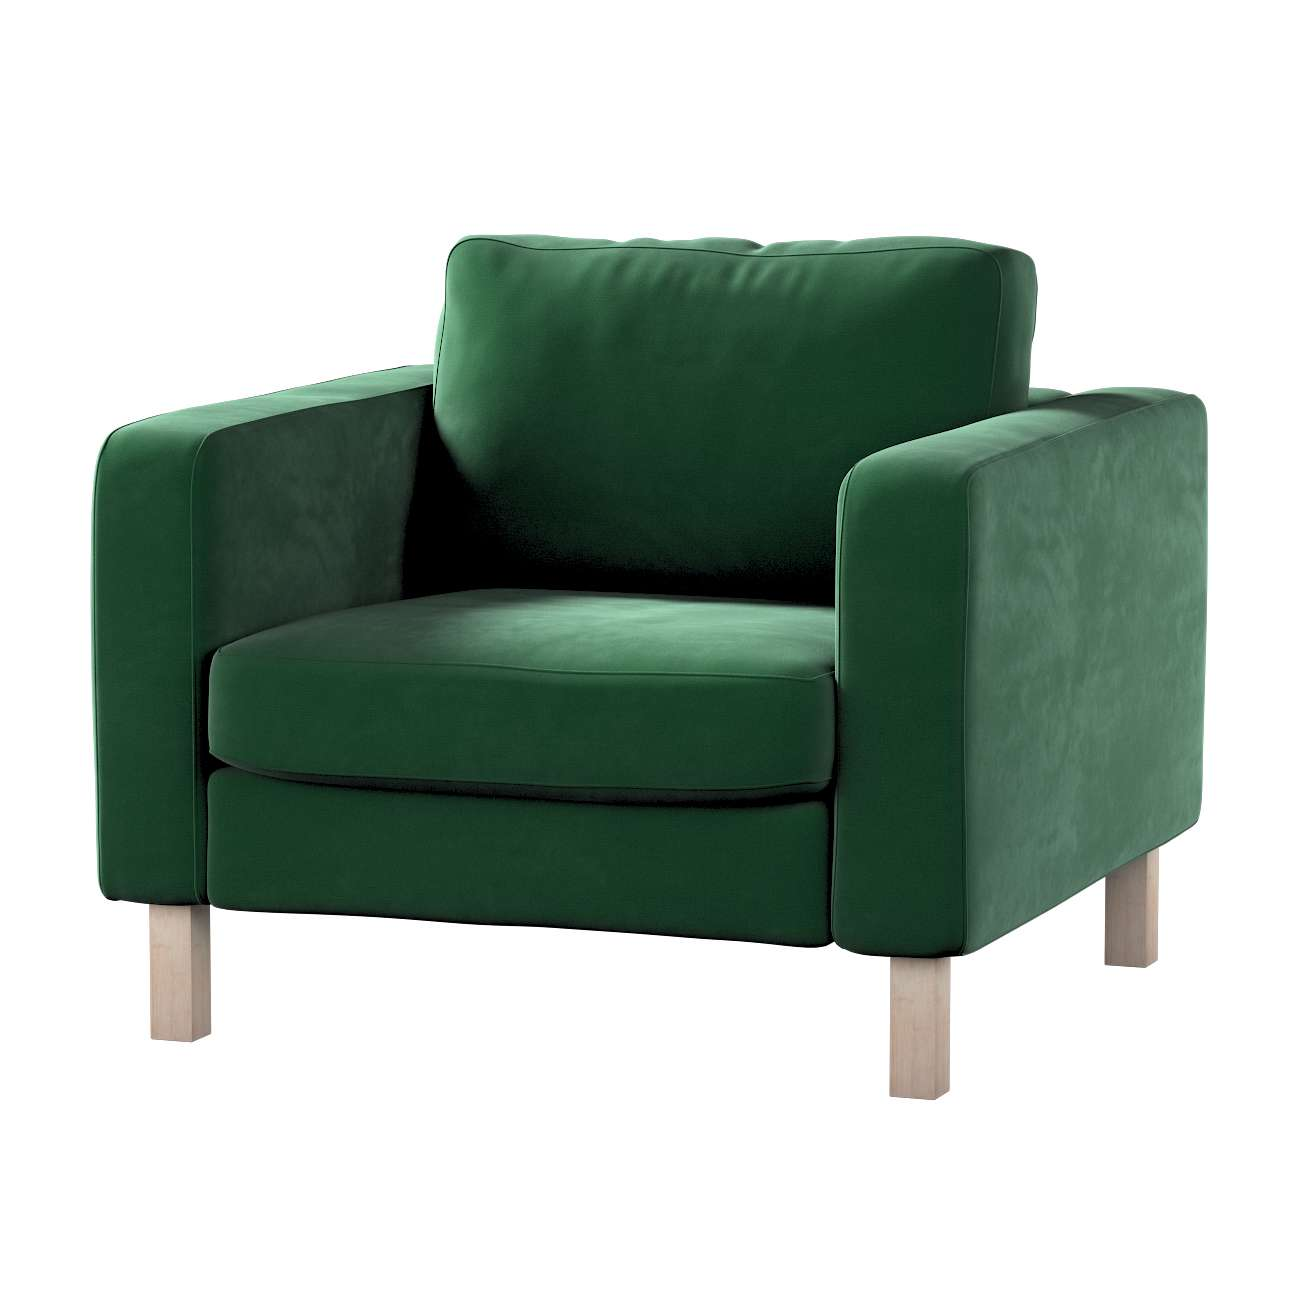 Pokrowiec na fotel Karlstad, krótki w kolekcji Velvet, tkanina: 704-13